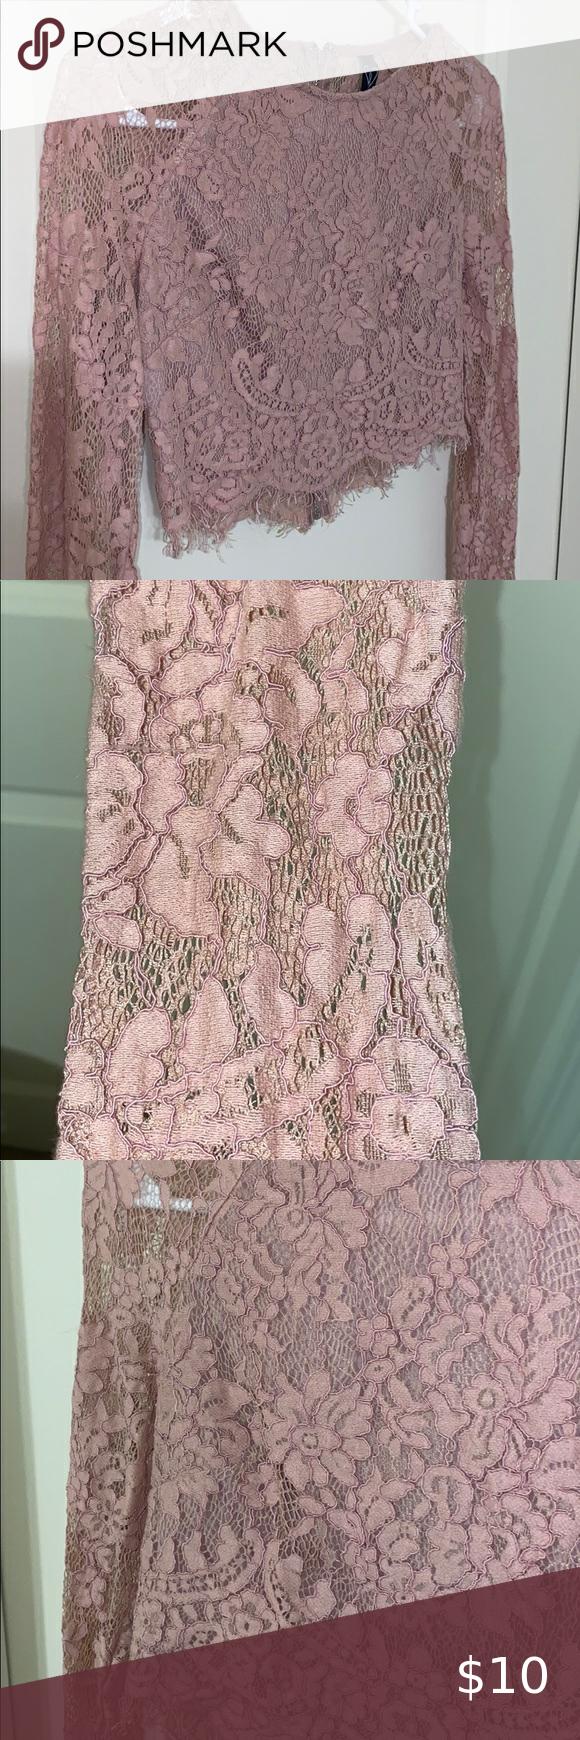 Faded Pink Lace Crop Top Faded Pink Lace Crop Top